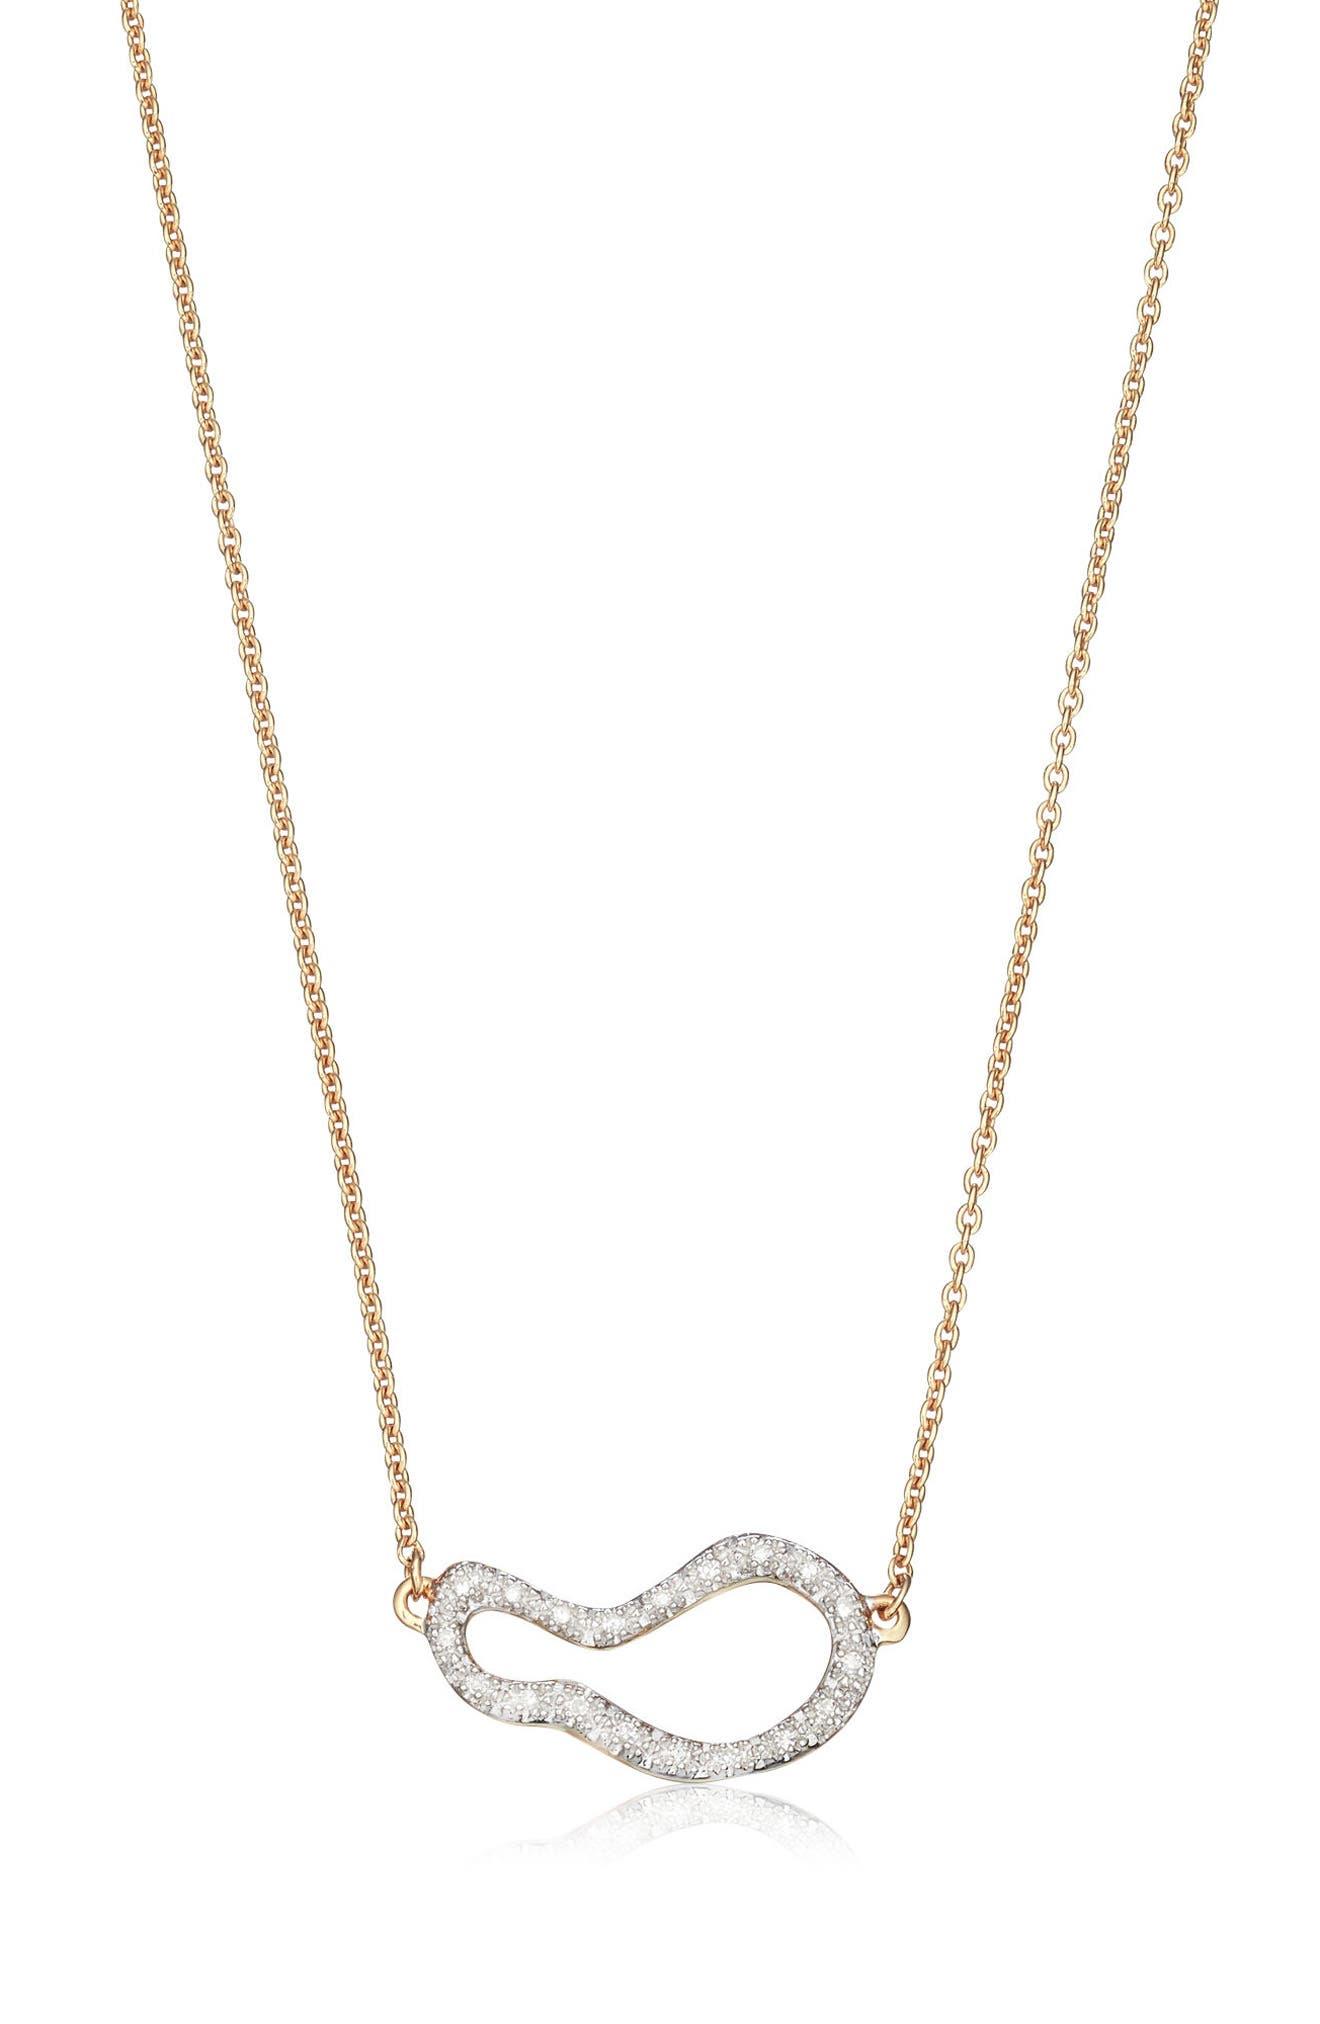 Riva Small Pod Diamond Necklace,                             Main thumbnail 1, color,                             715